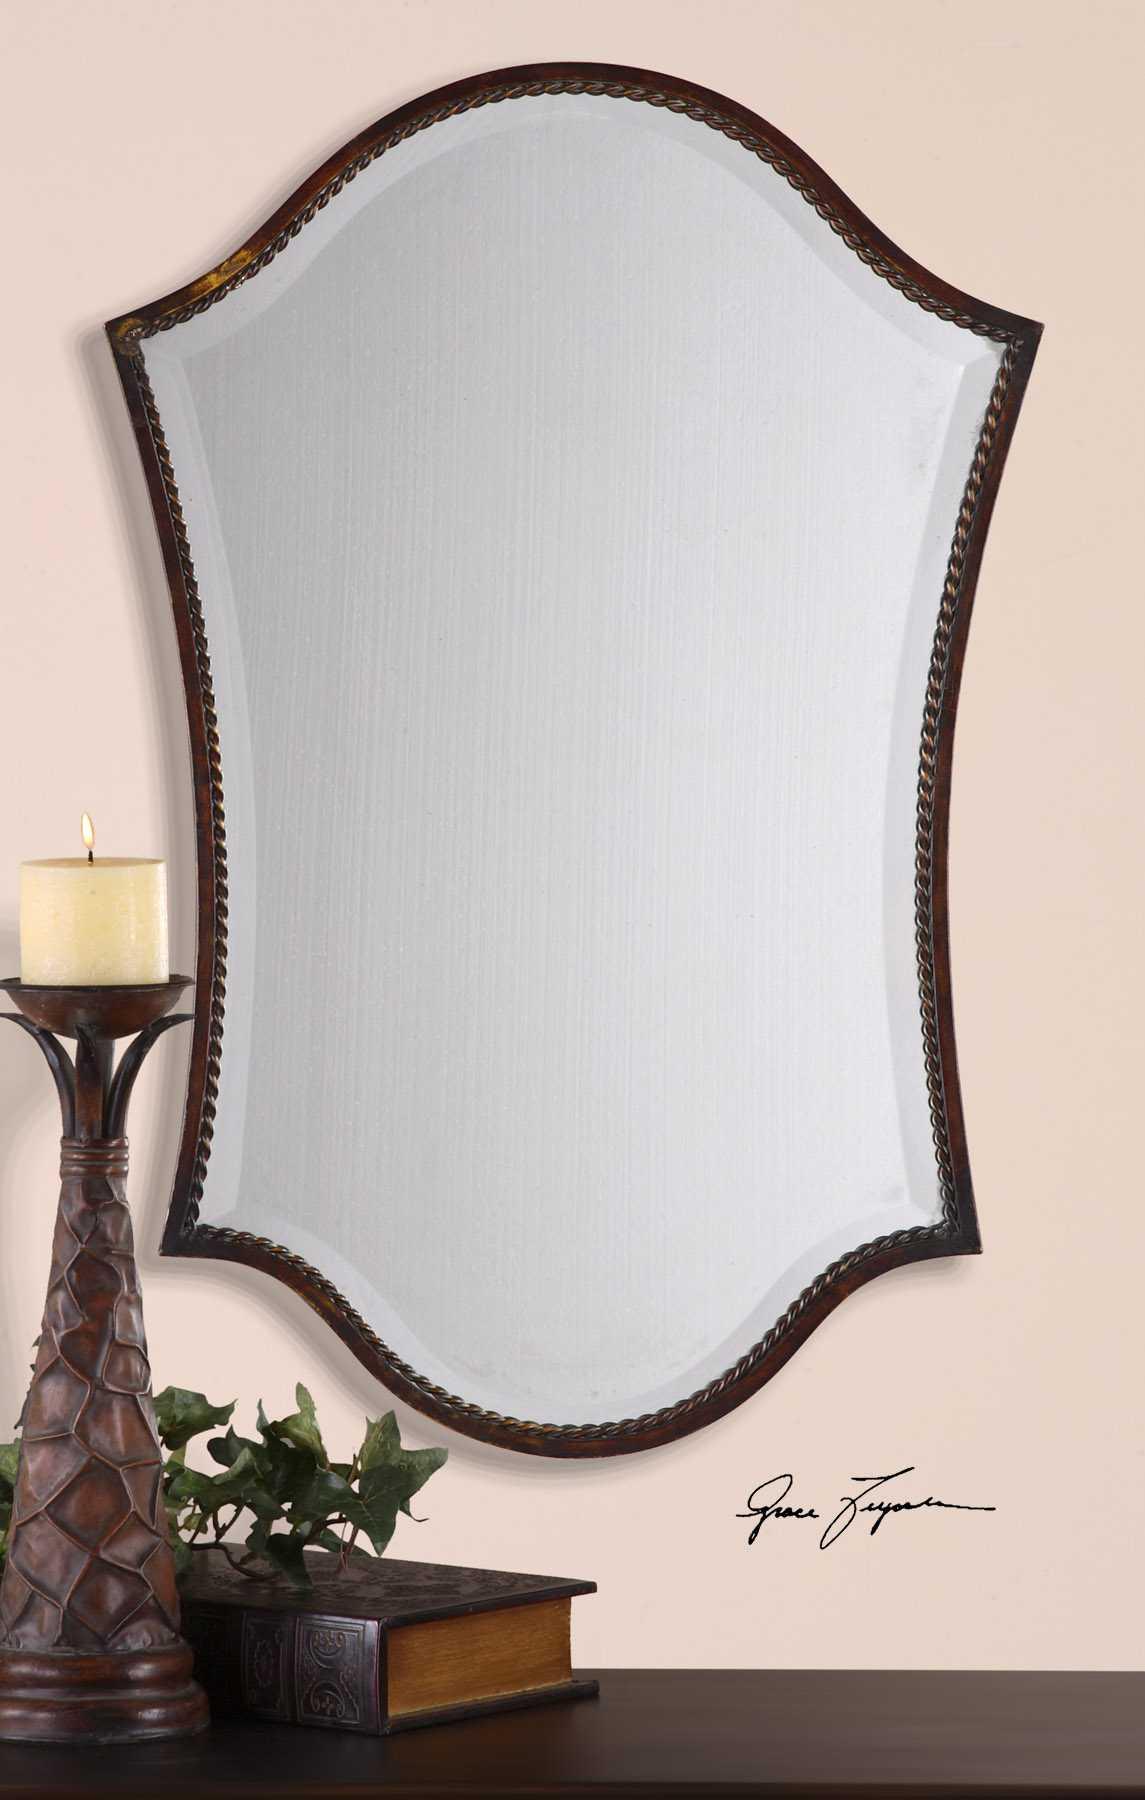 Uttermost abra 20 x 30 bronze vanity wall mirror ut13584b for Mirror 20 x 30